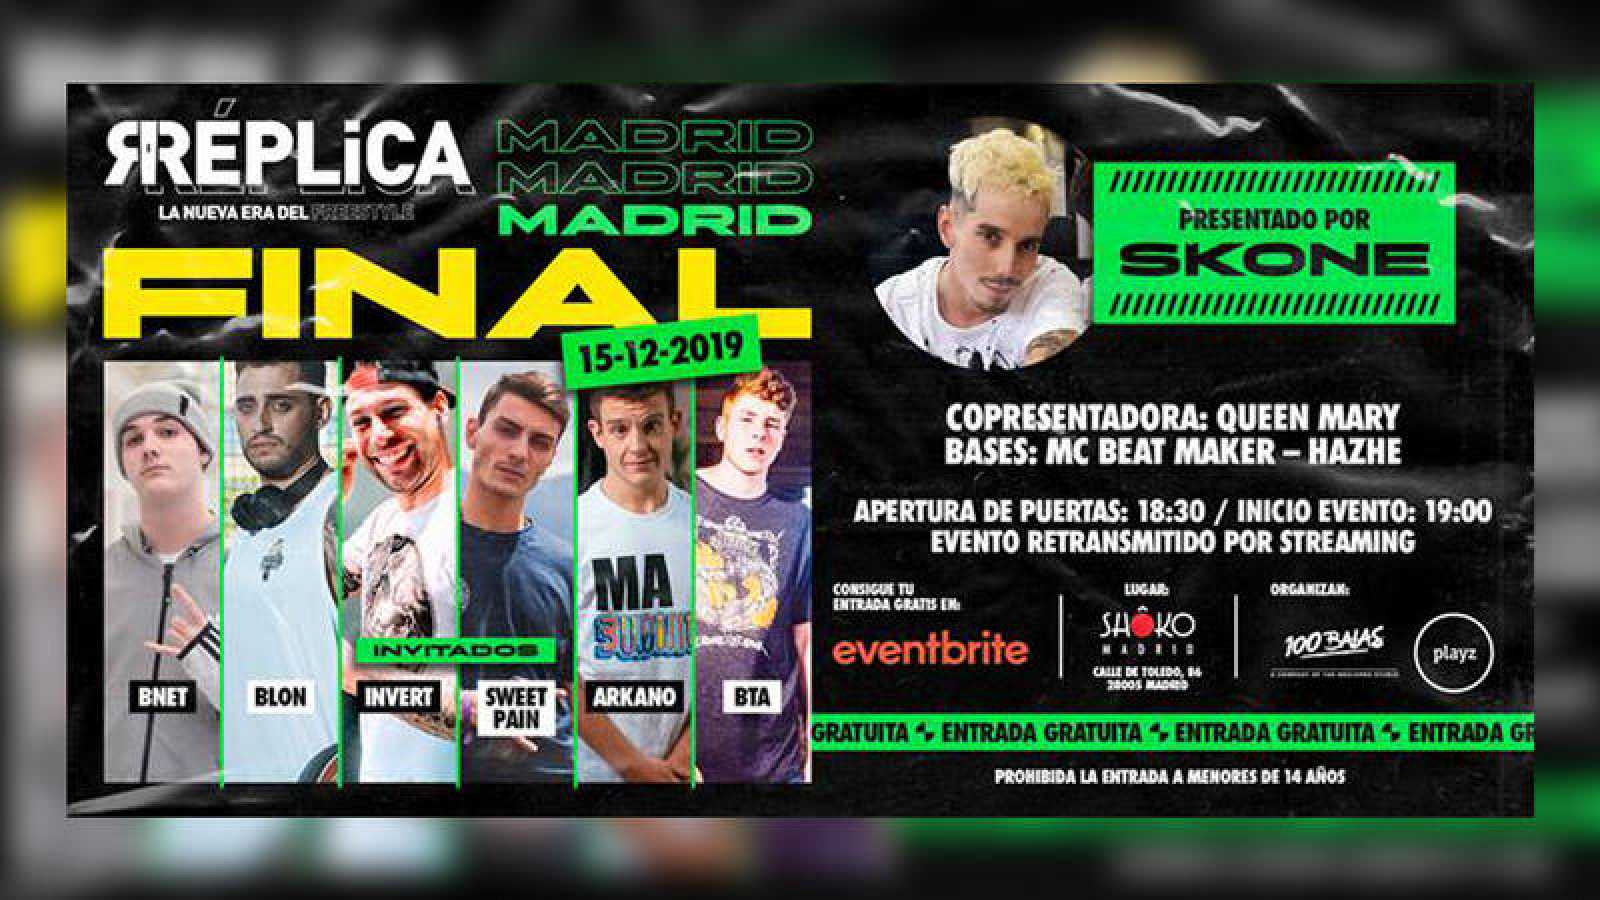 El evento se celebrará en la sala Shoko de Madrid